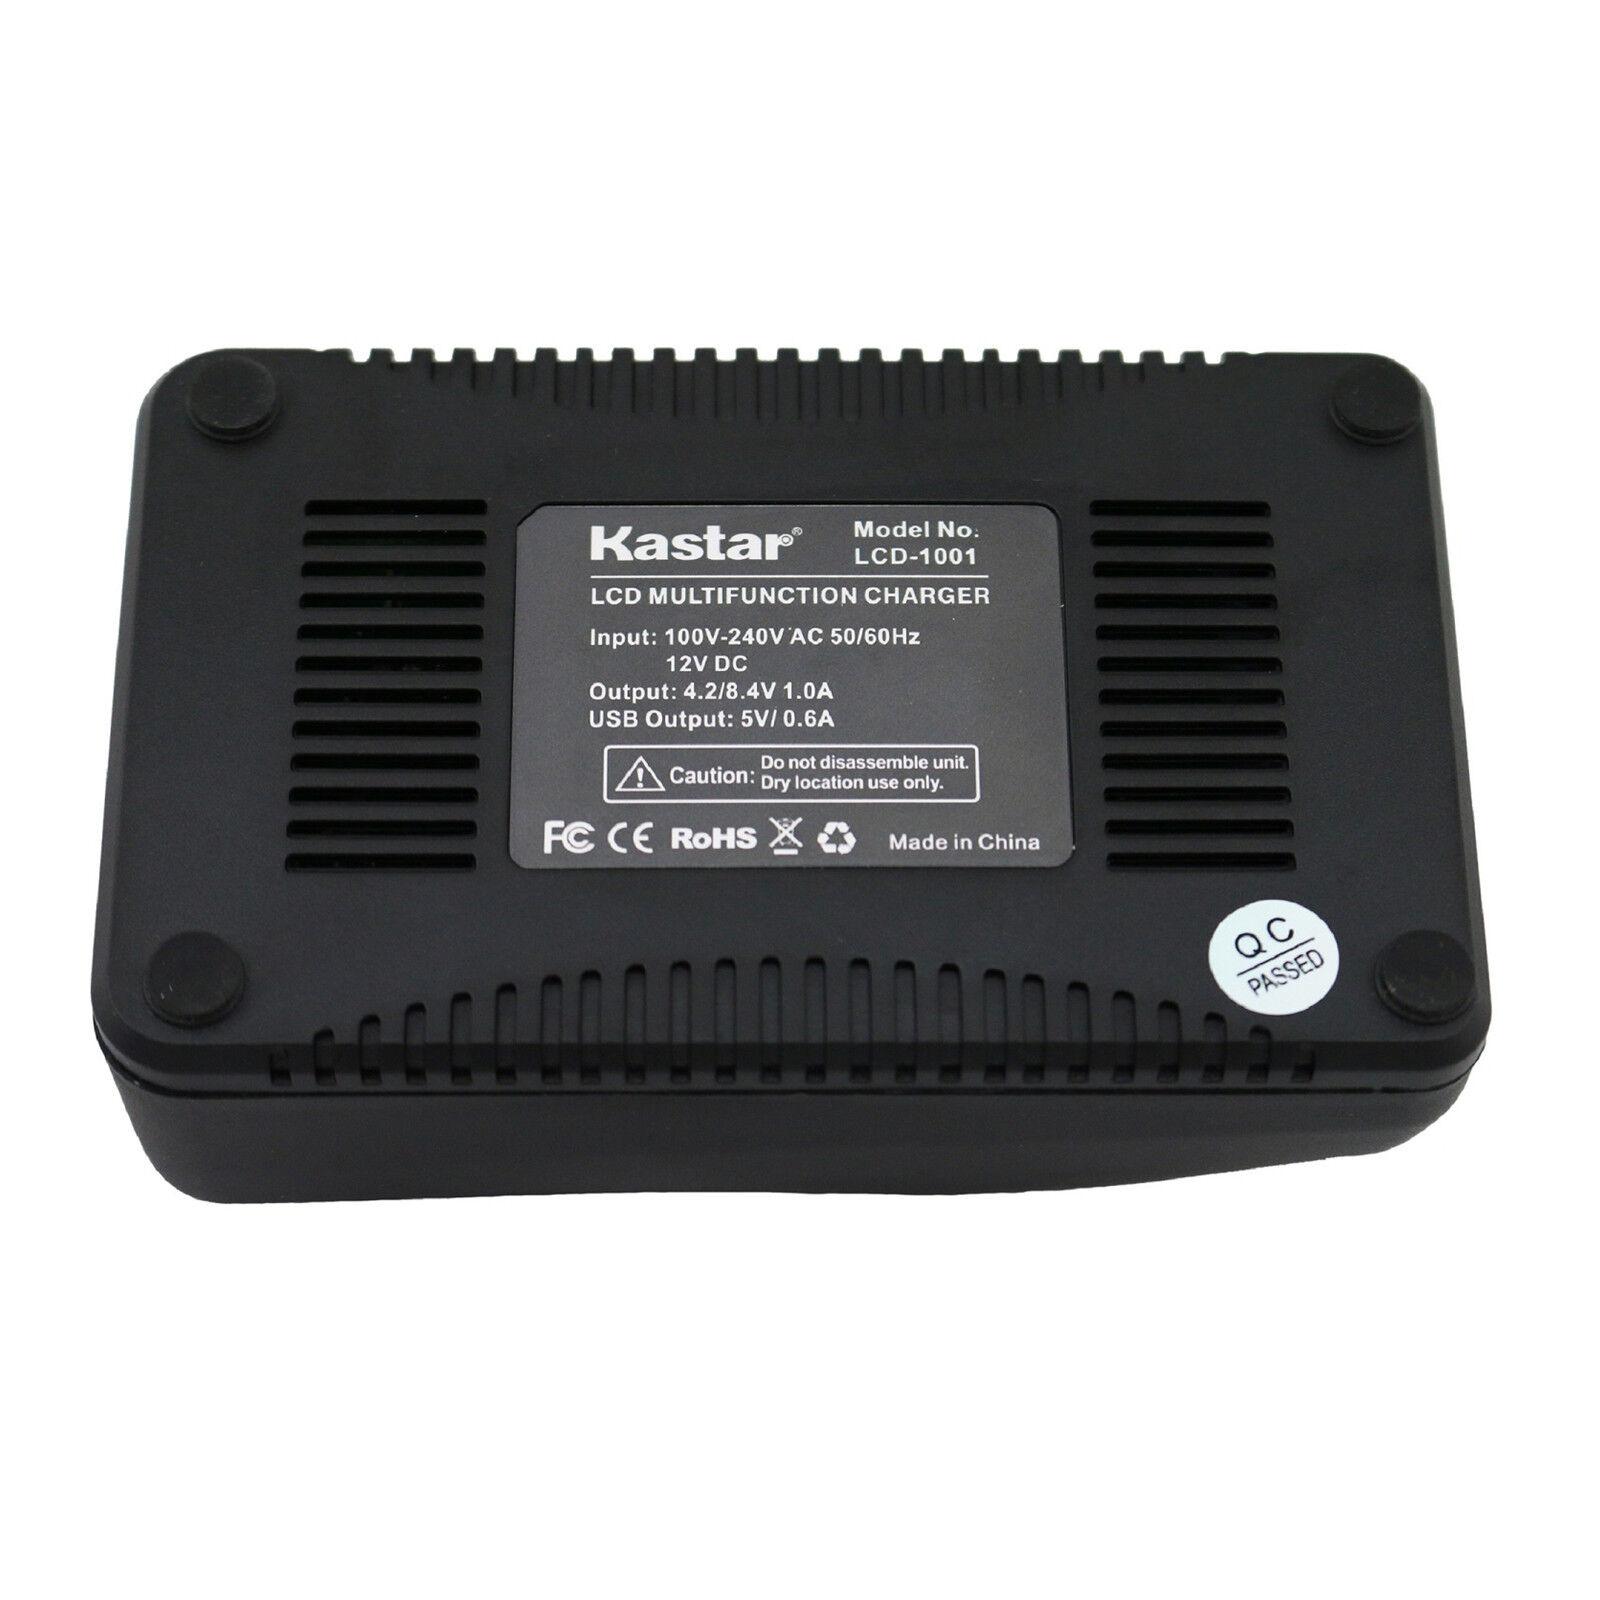 Купить Kastar Gopro3 AHDBT-302 - Kastar Battery Charger GoPro HD HERO3 HERO3+ GoPro AHDBT-201 AHDBT-301 AHDBT-302